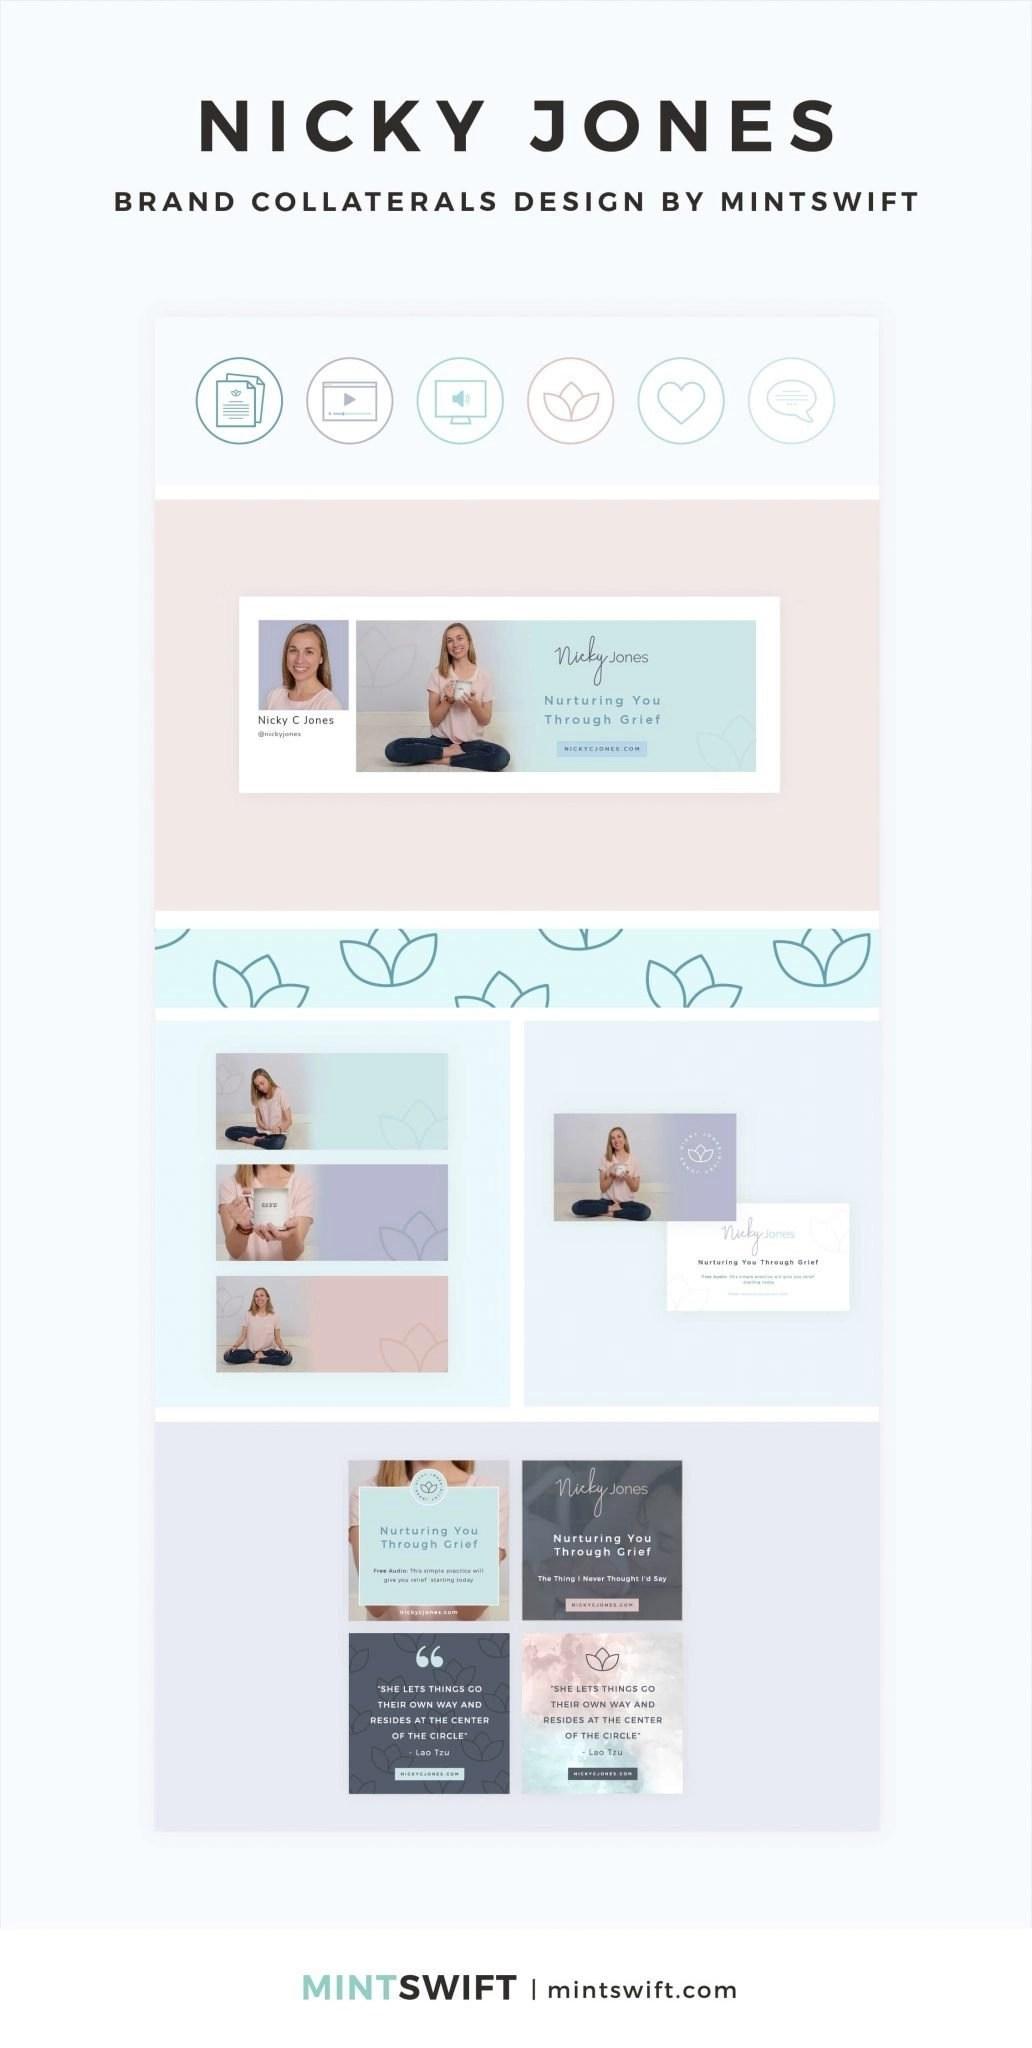 Nicky Jones - Brand Collaterals Design - MintSwift - Adrianna Leszczynska